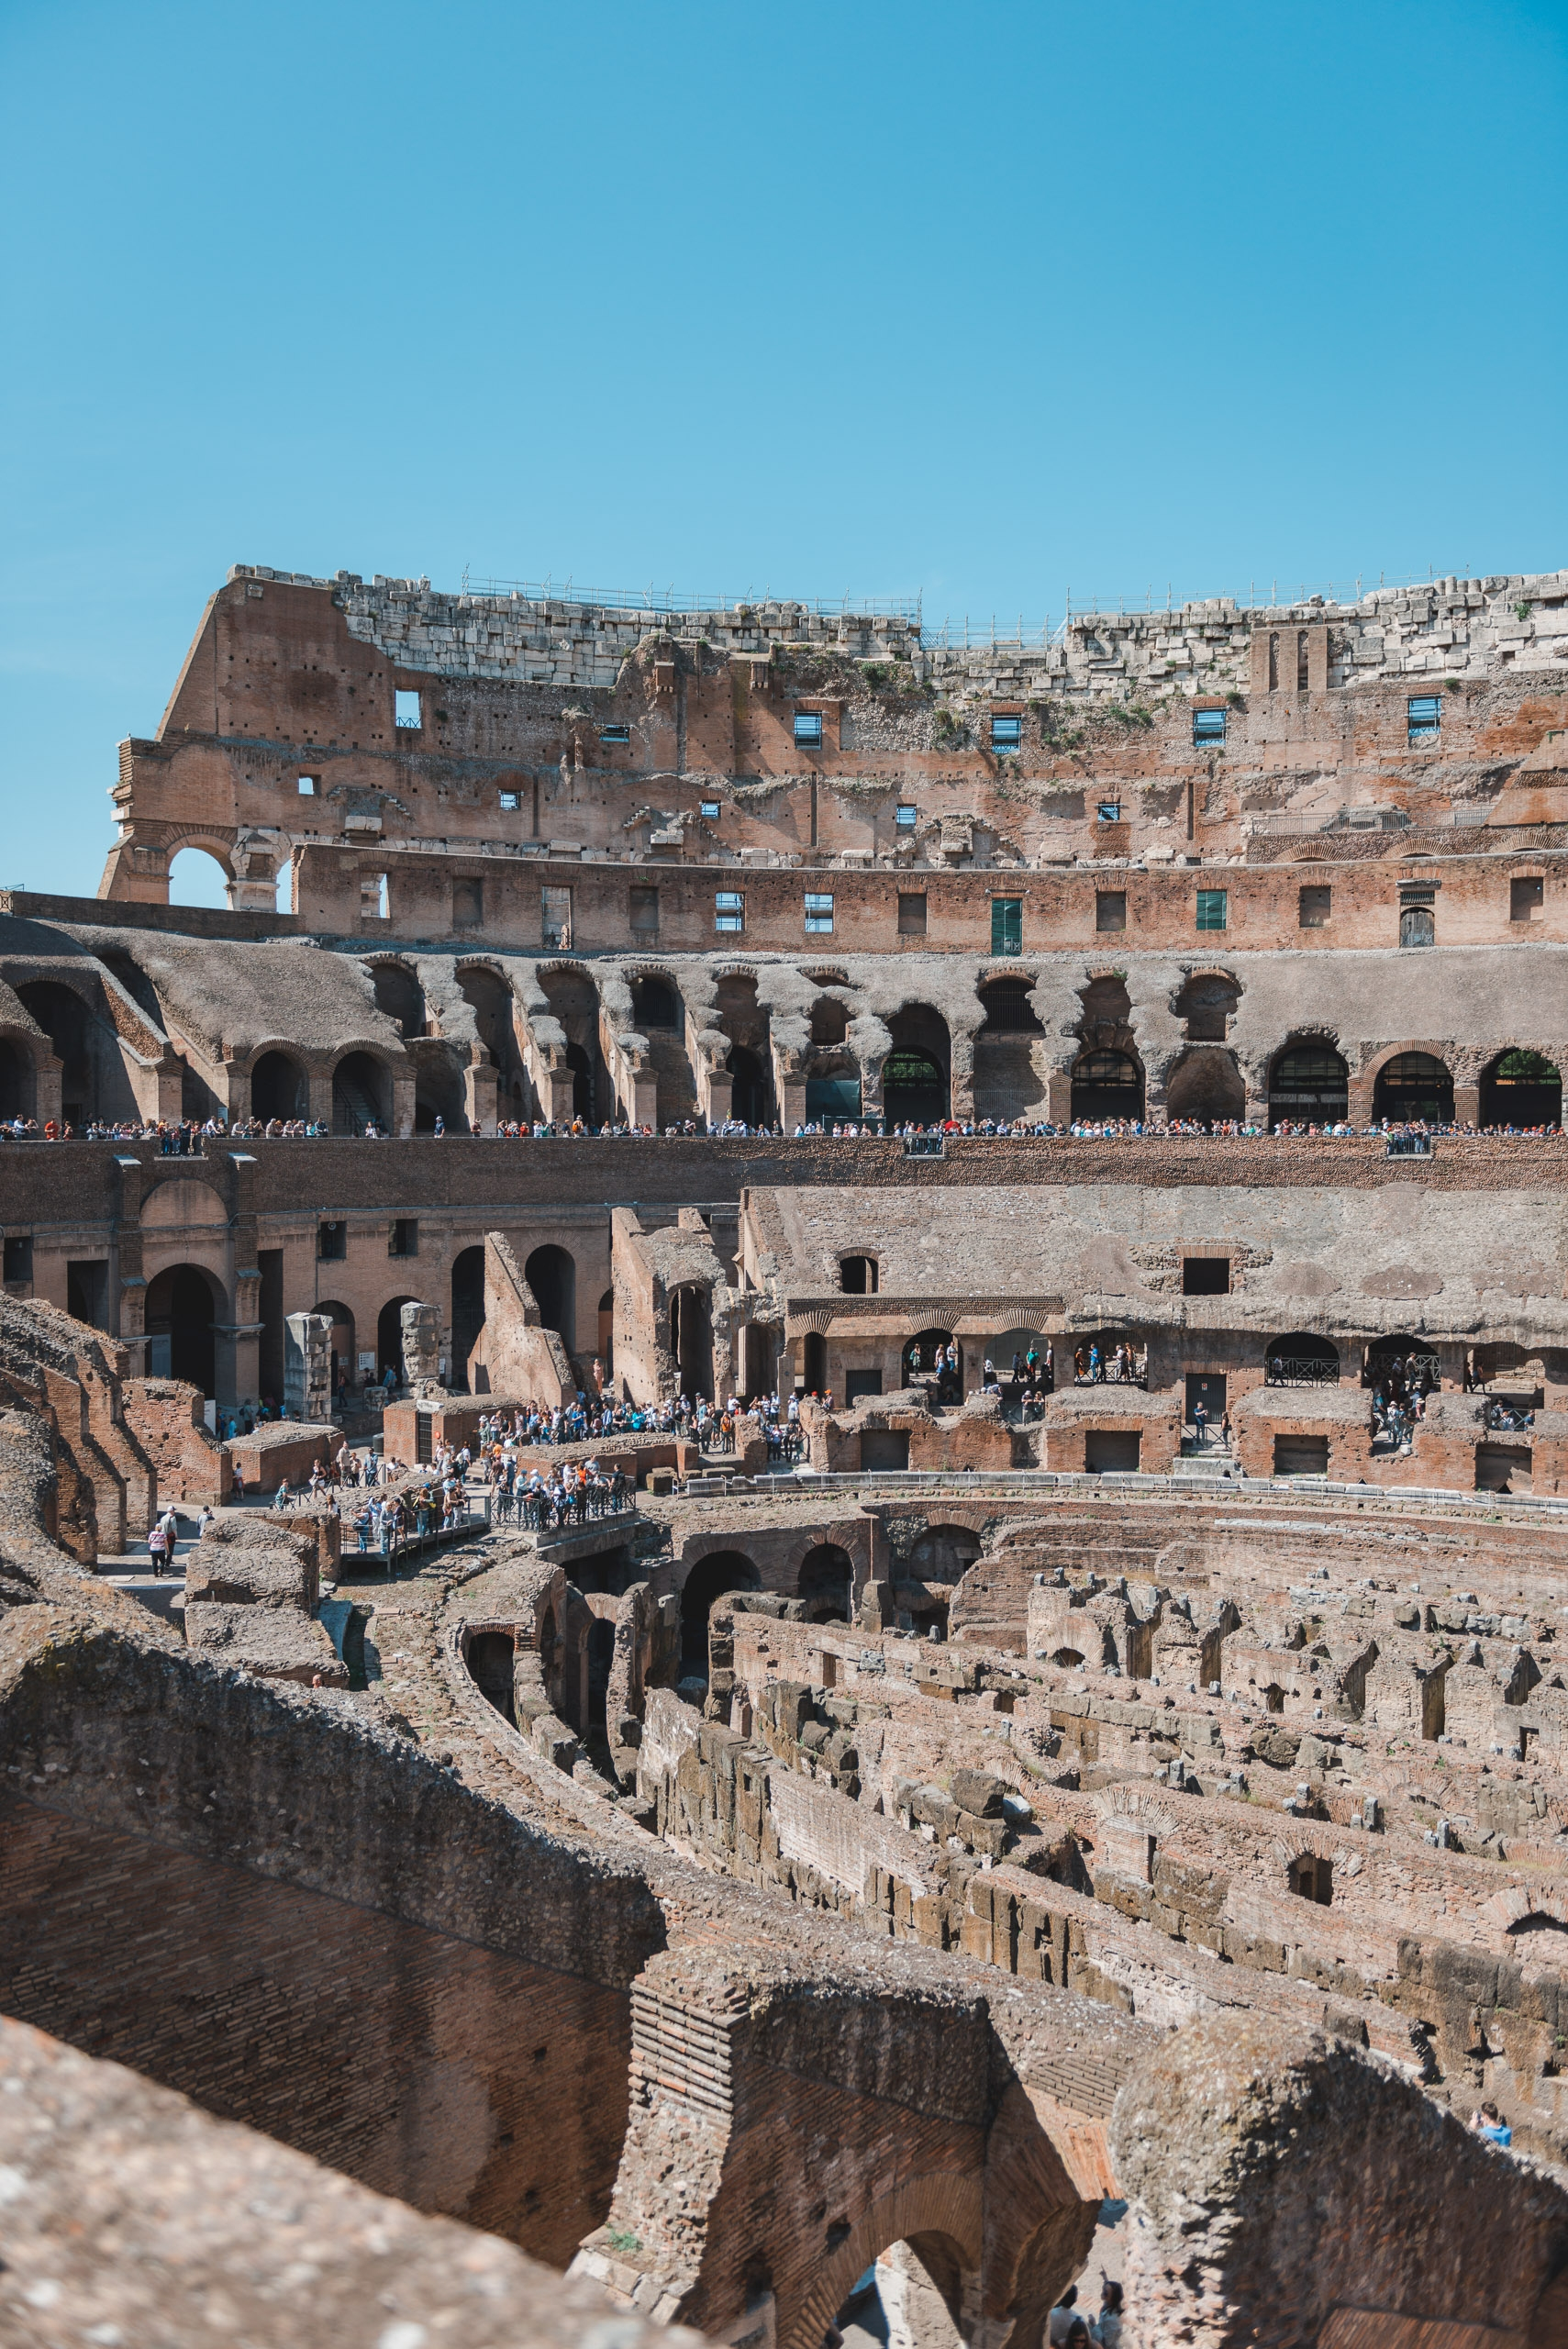 The Colosseum 3